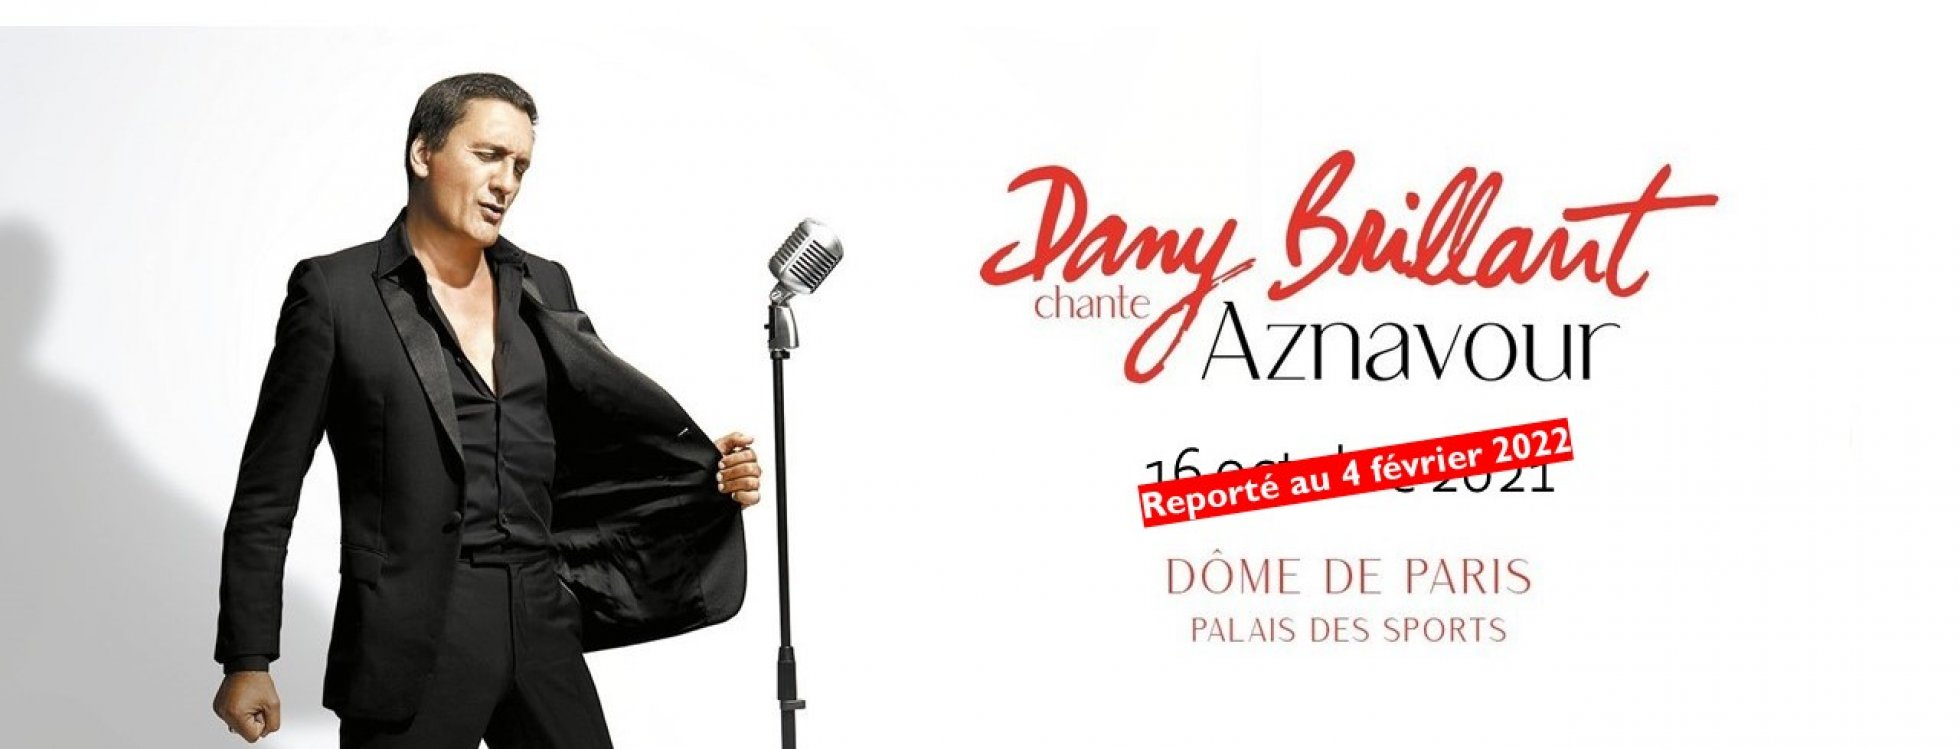 dome de paris : DANY BRILLANT